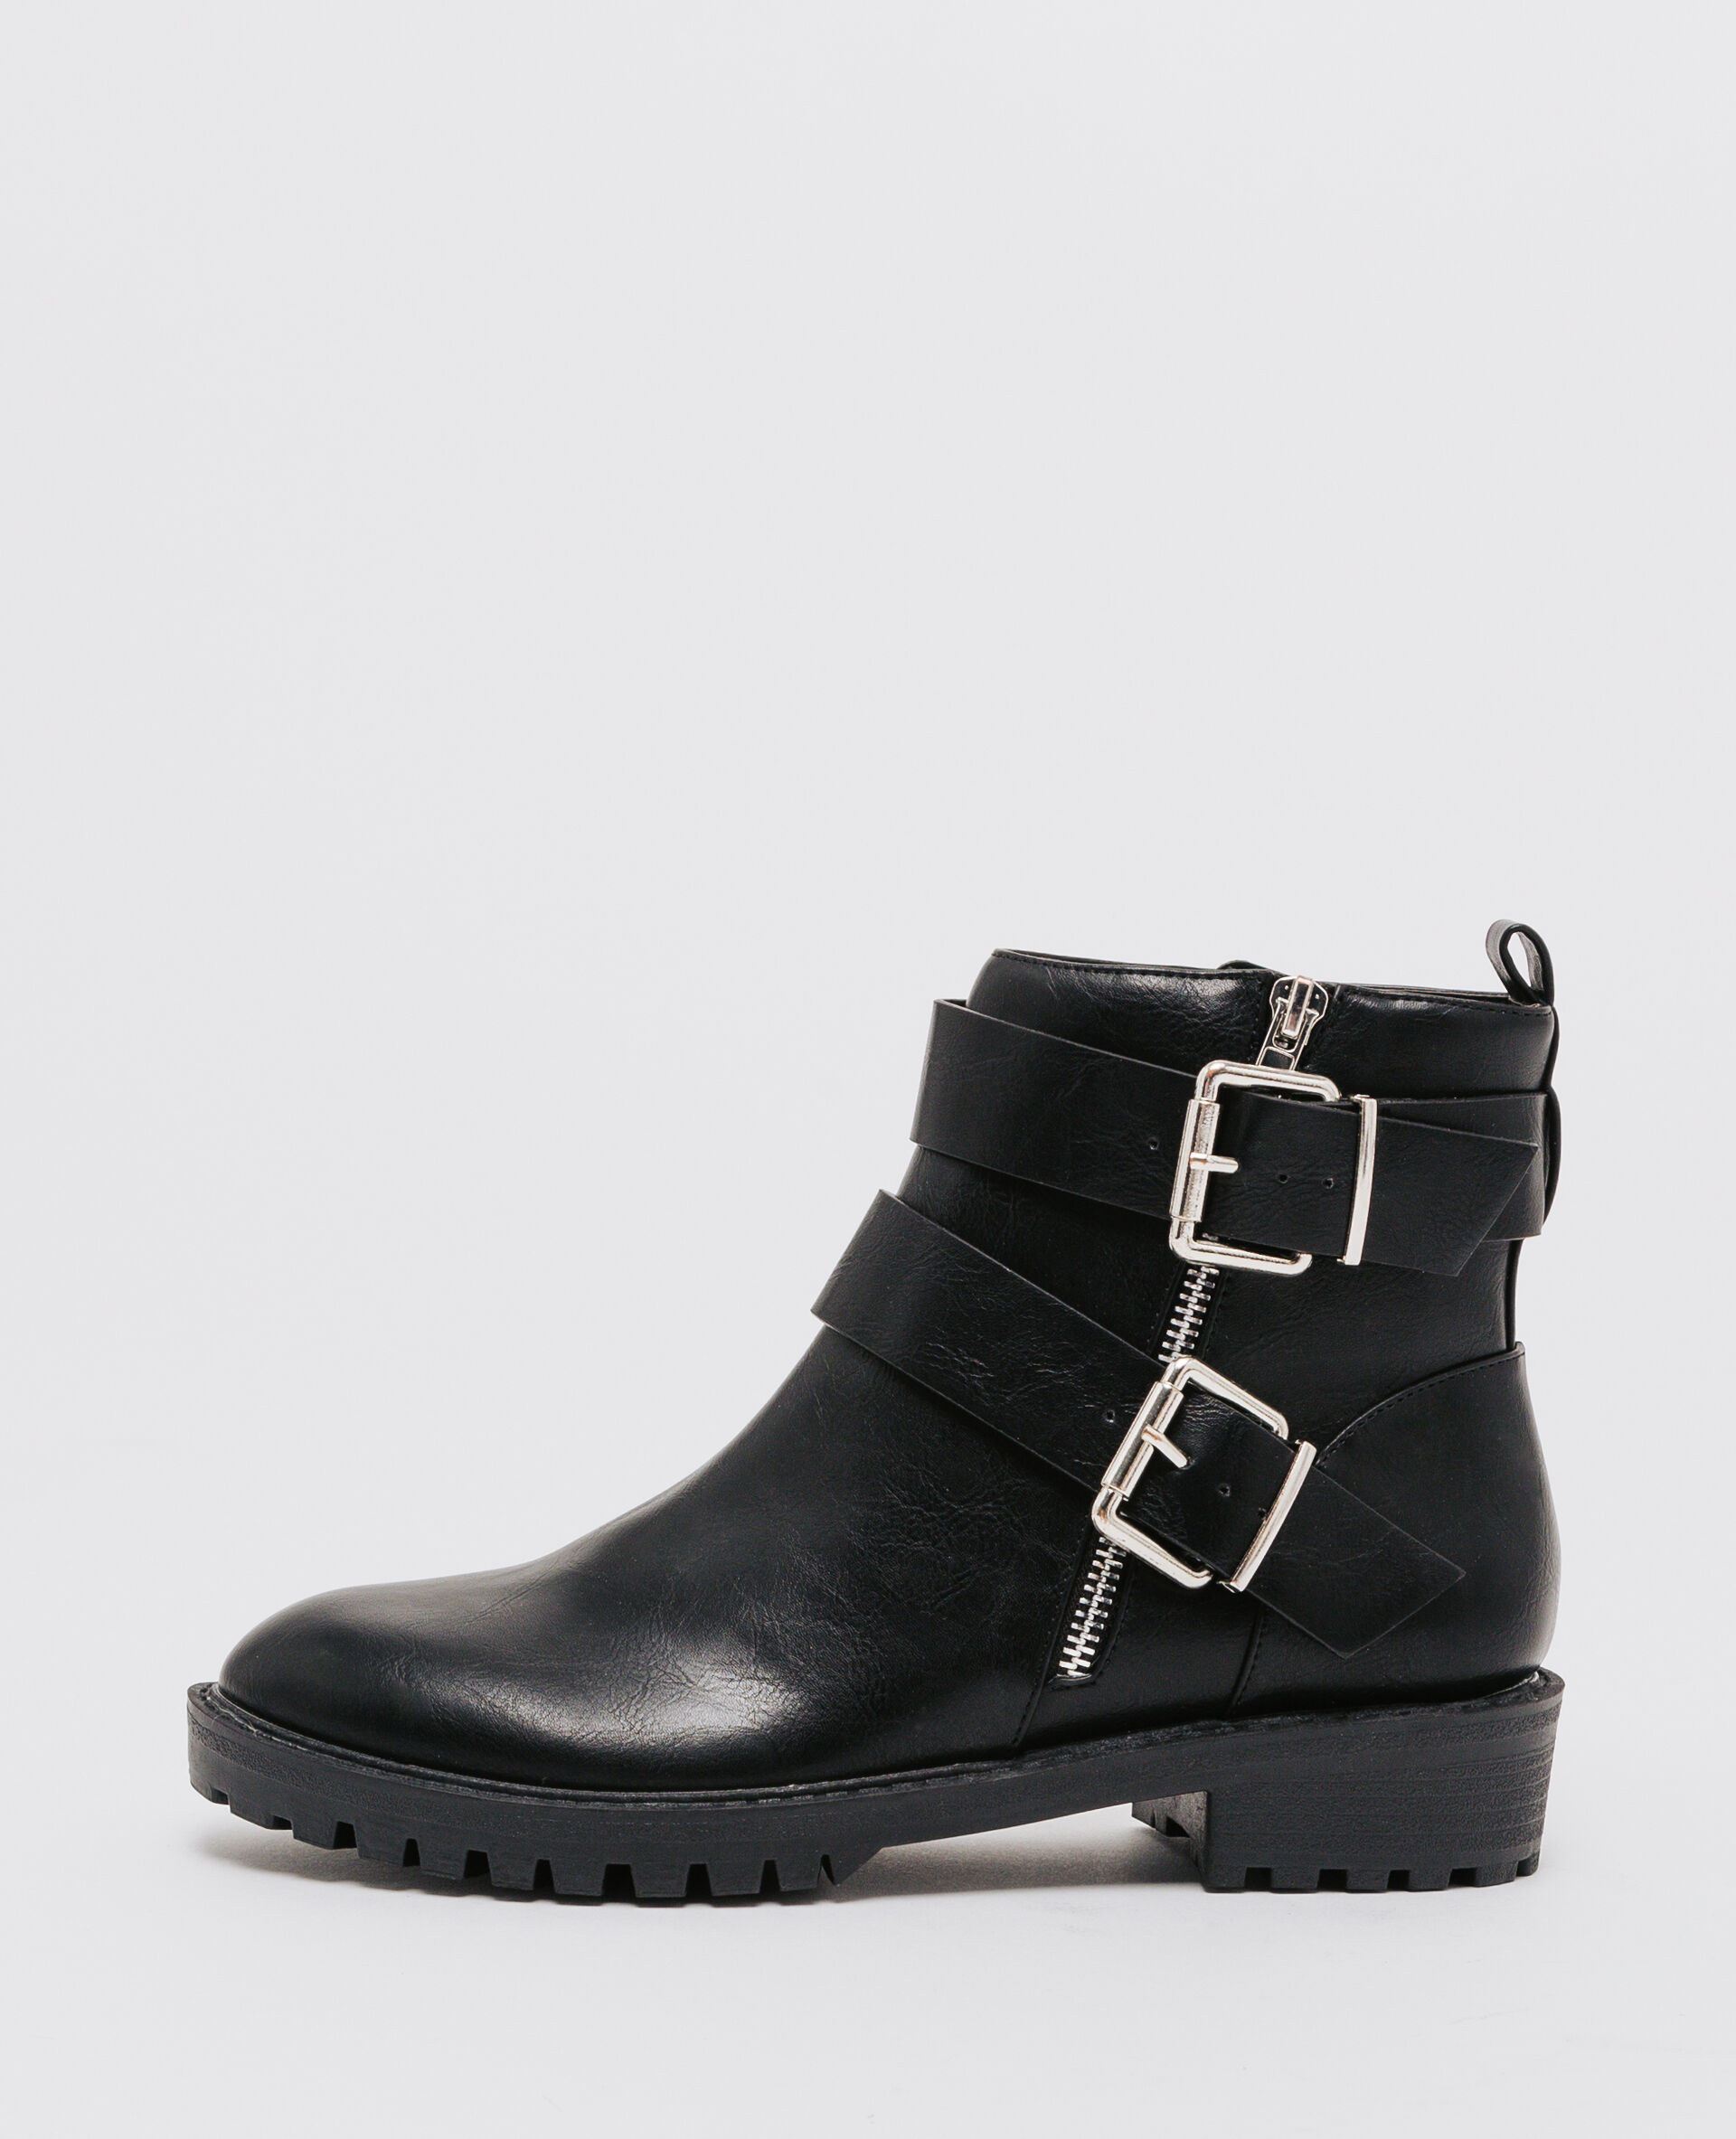 Motard Boots Pimkie Esprit Noir 907190899a08 ZaaR50T